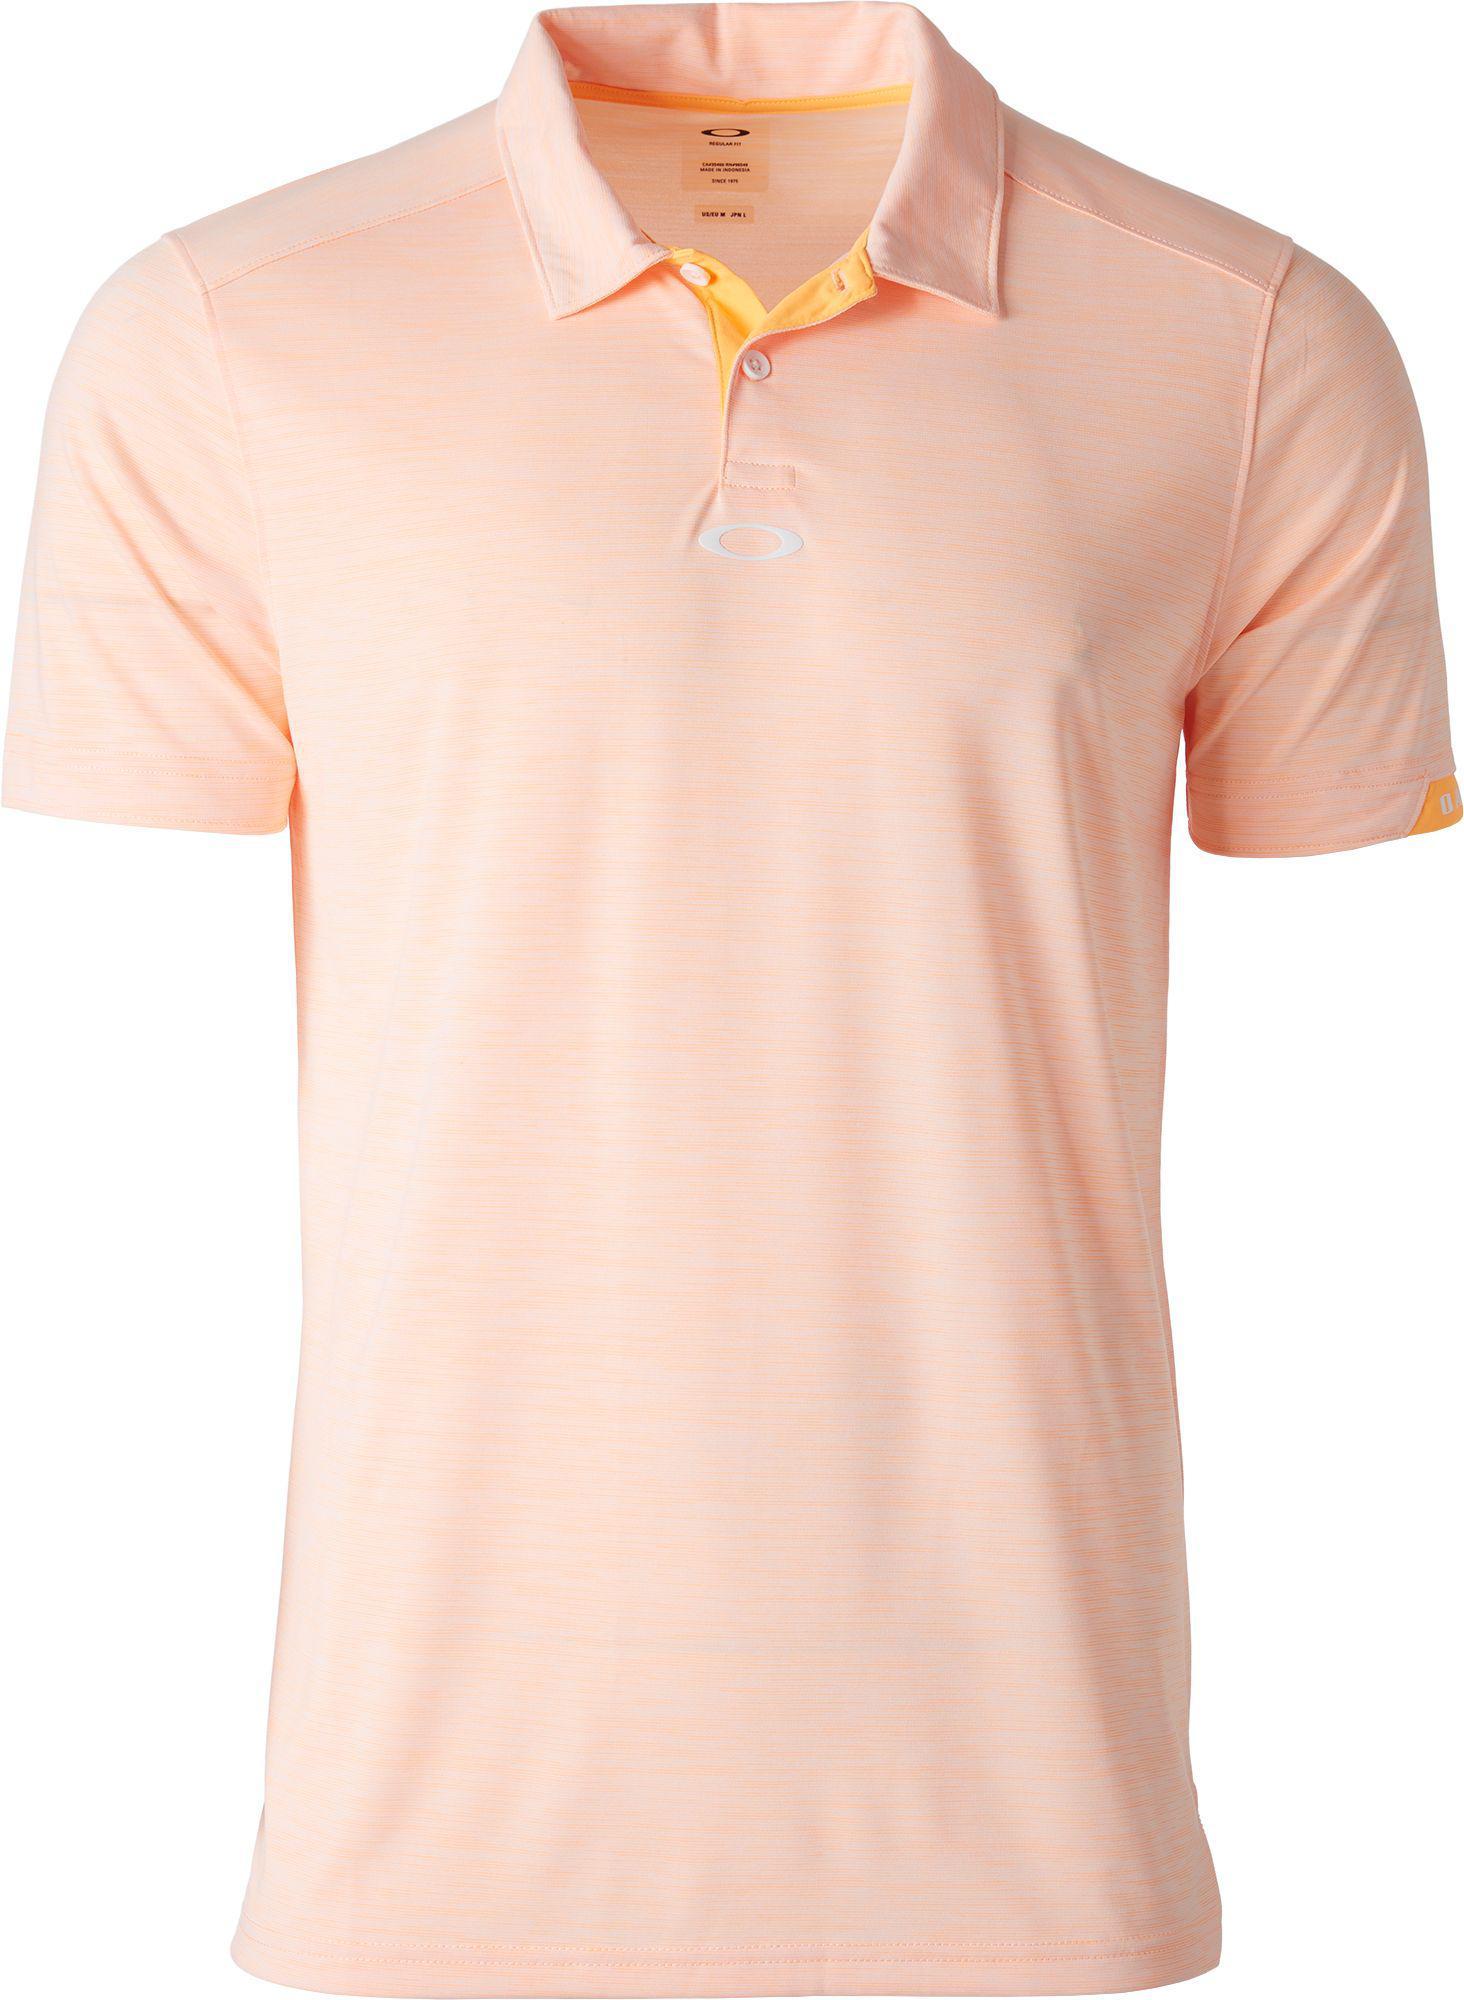 67cccb1828 Lyst - Oakley Gravity Golf Polo in Orange for Men